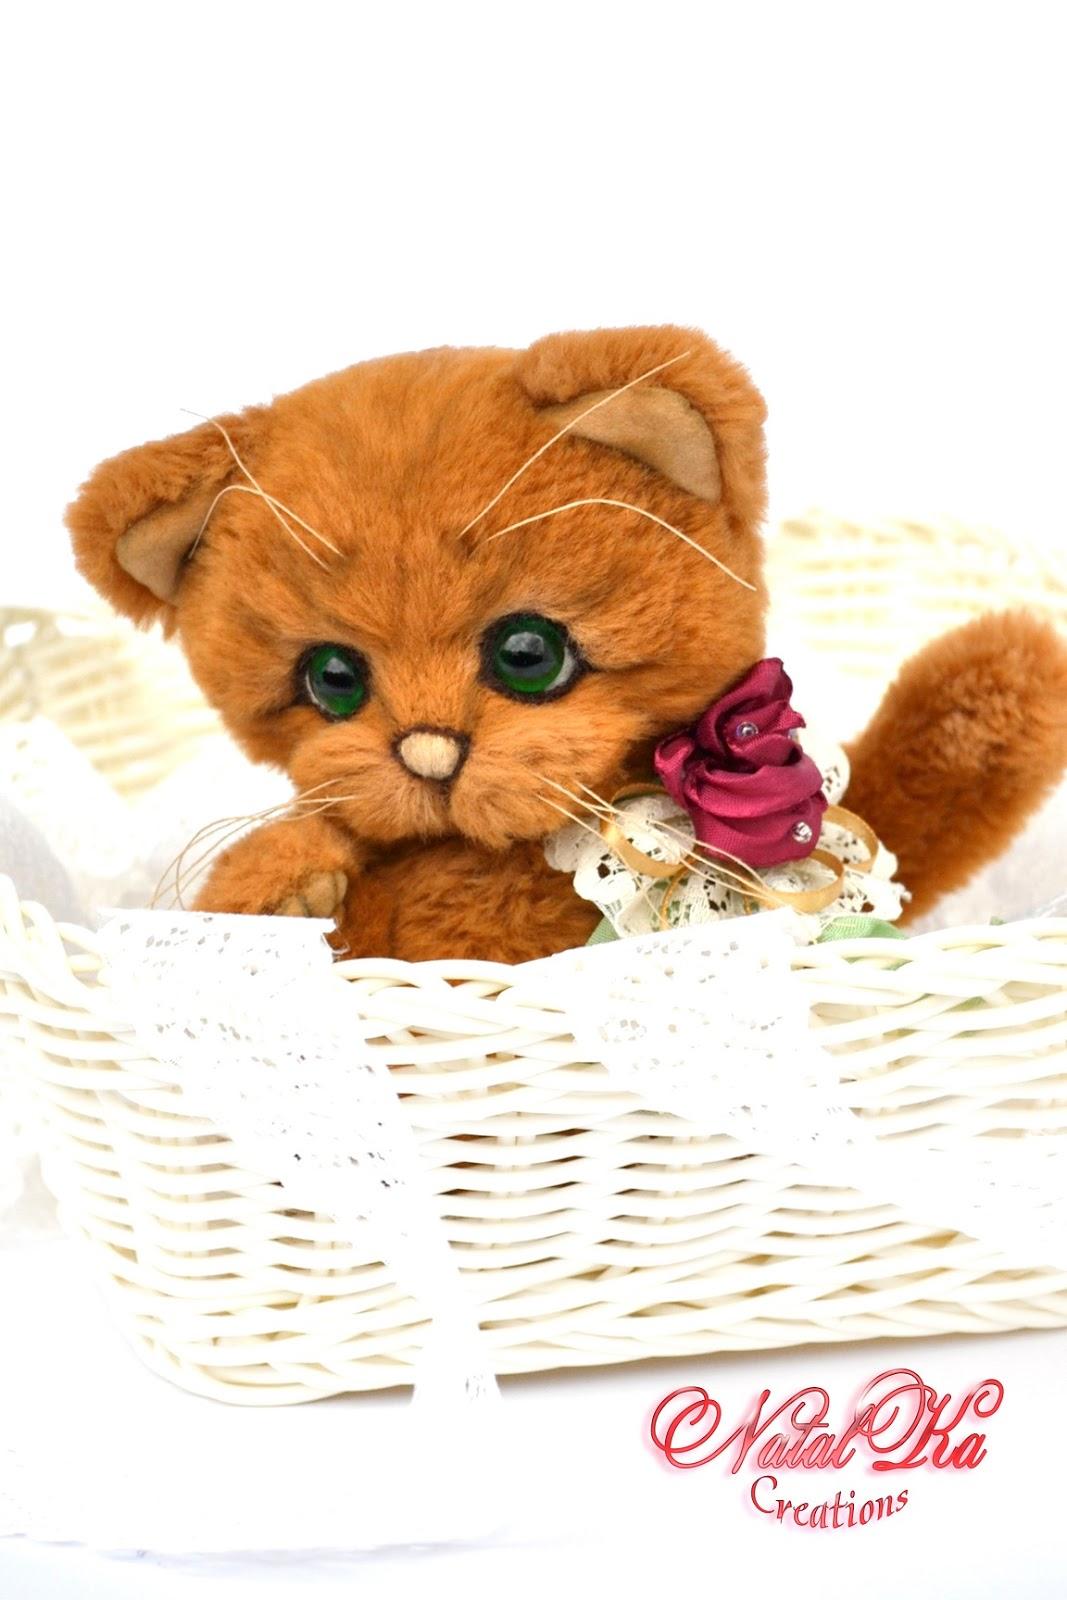 Artist teddy cat, artist teddy, teddies, ooak, handmade byNatalKa Creations. Авторский кот тедди, котенок, кошка, ручная работа в единственном экземпляре от NatalKa Creations